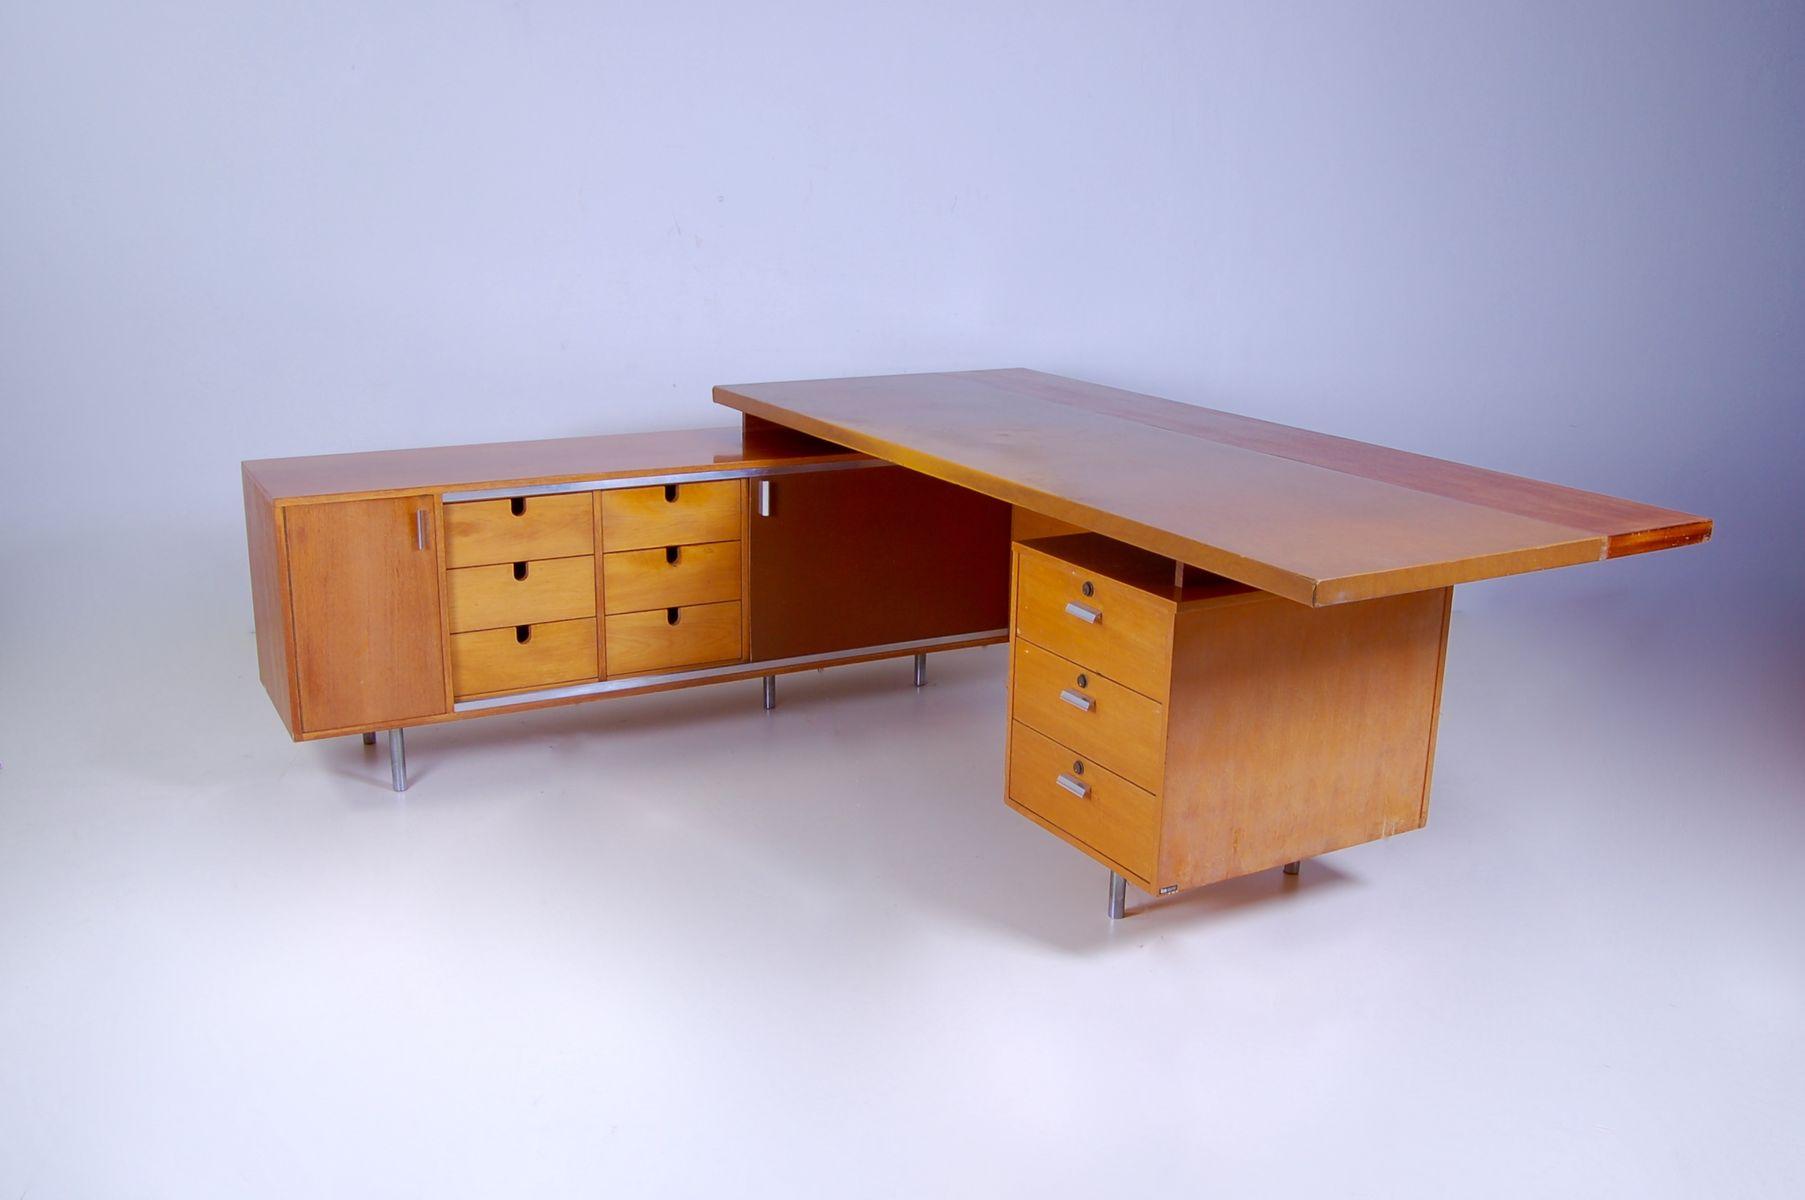 Mobili vintage bergamo - I mobili di luca ...